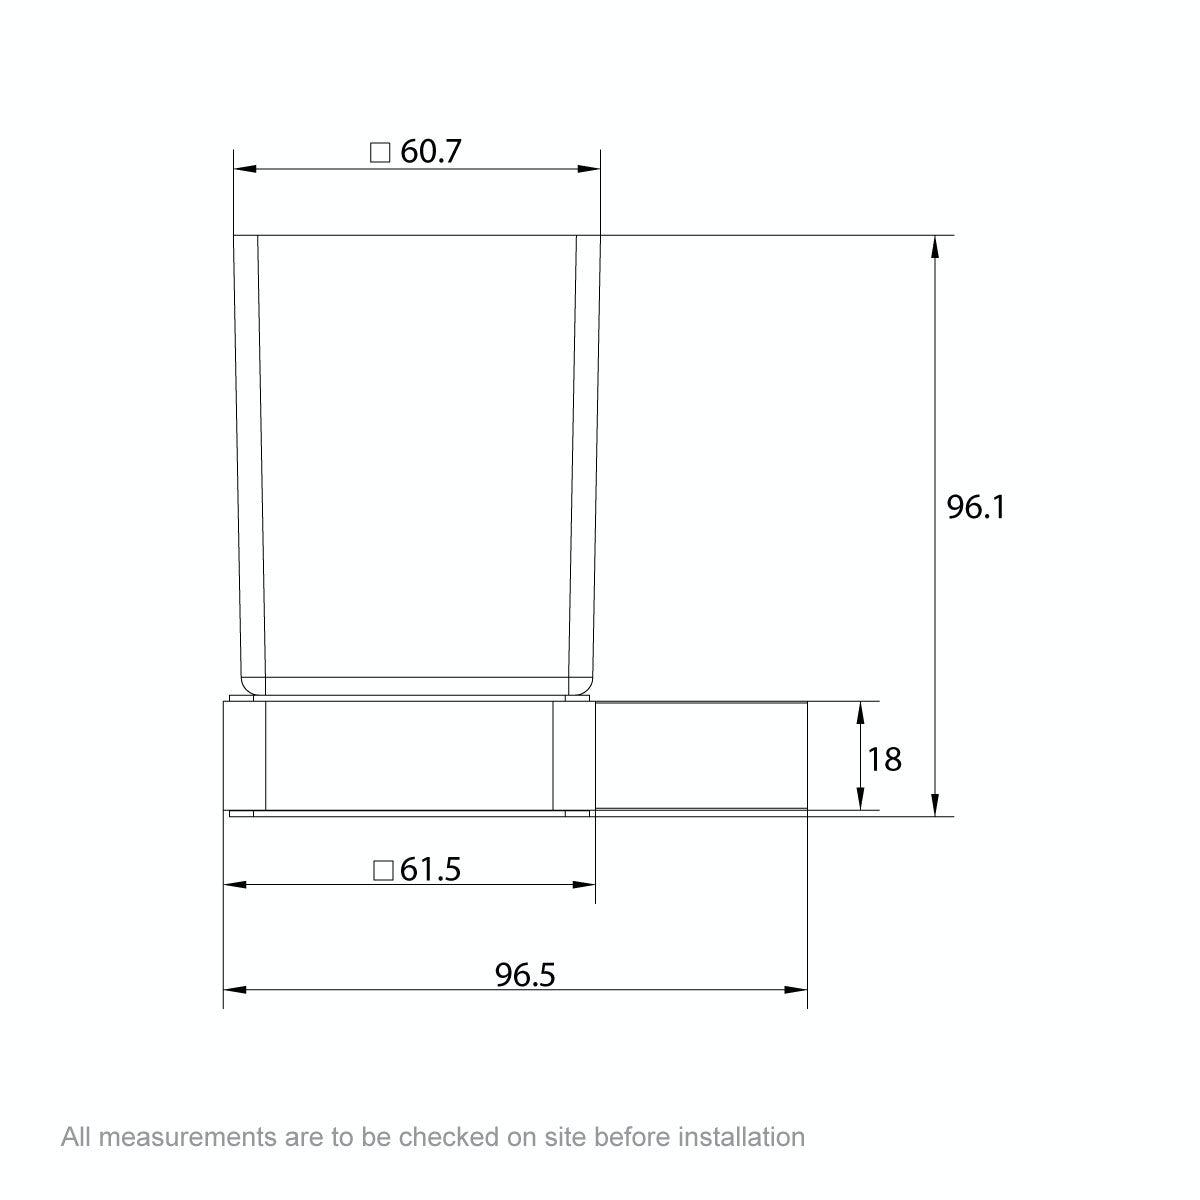 Dimensions for Mode Spencer rose gold tumbler and holder